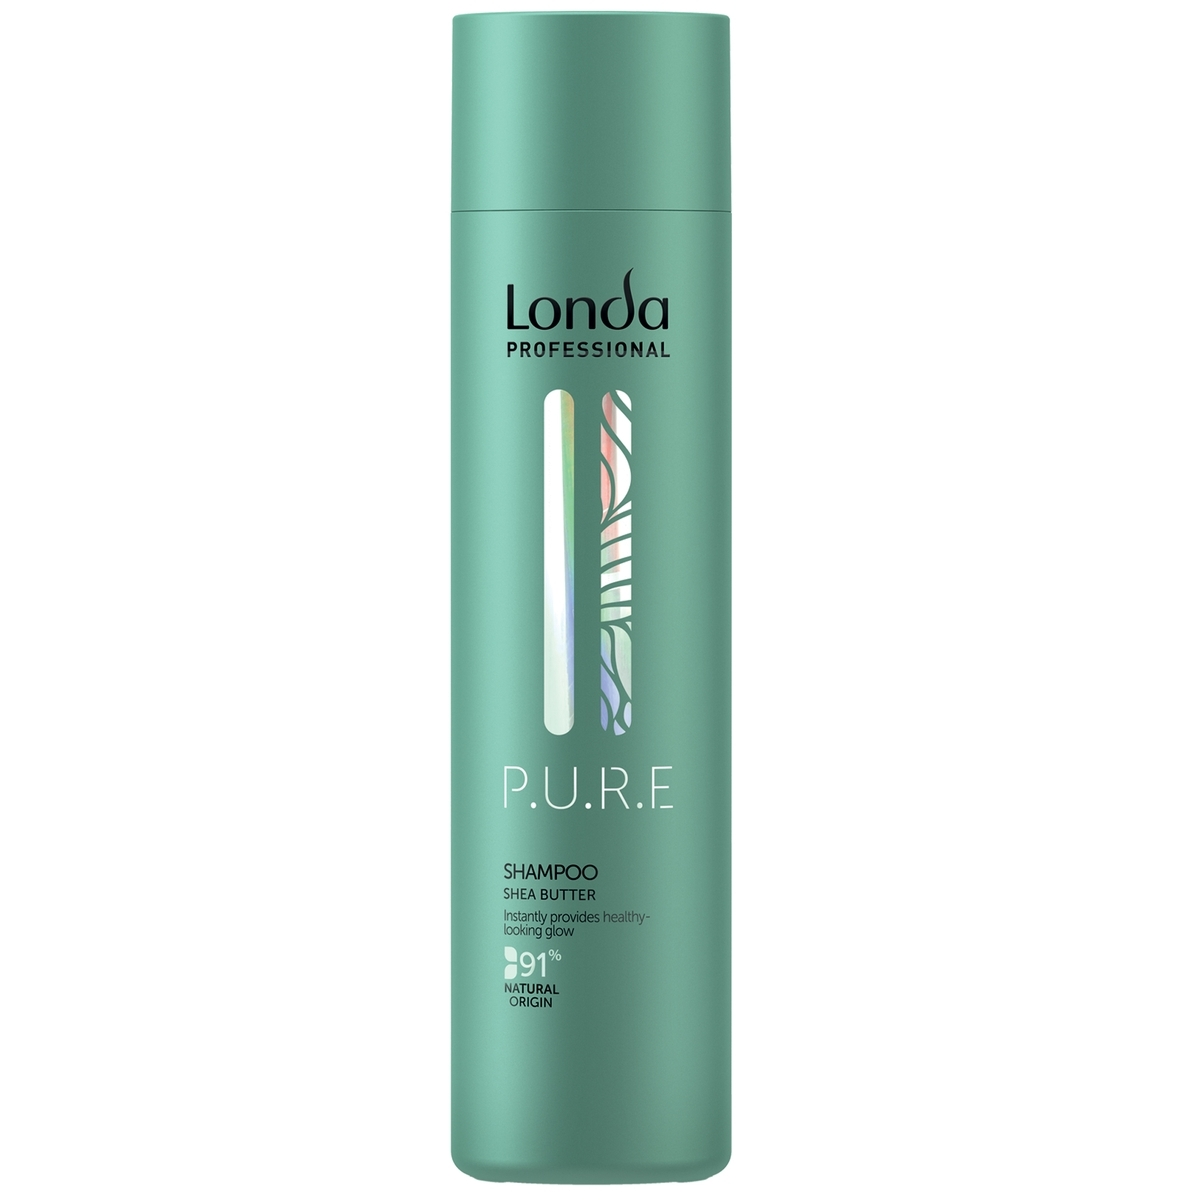 LONDA Шампунь P.U.R.E, 250 мл insight увлажняющий шампунь для сухих волос 400 мл